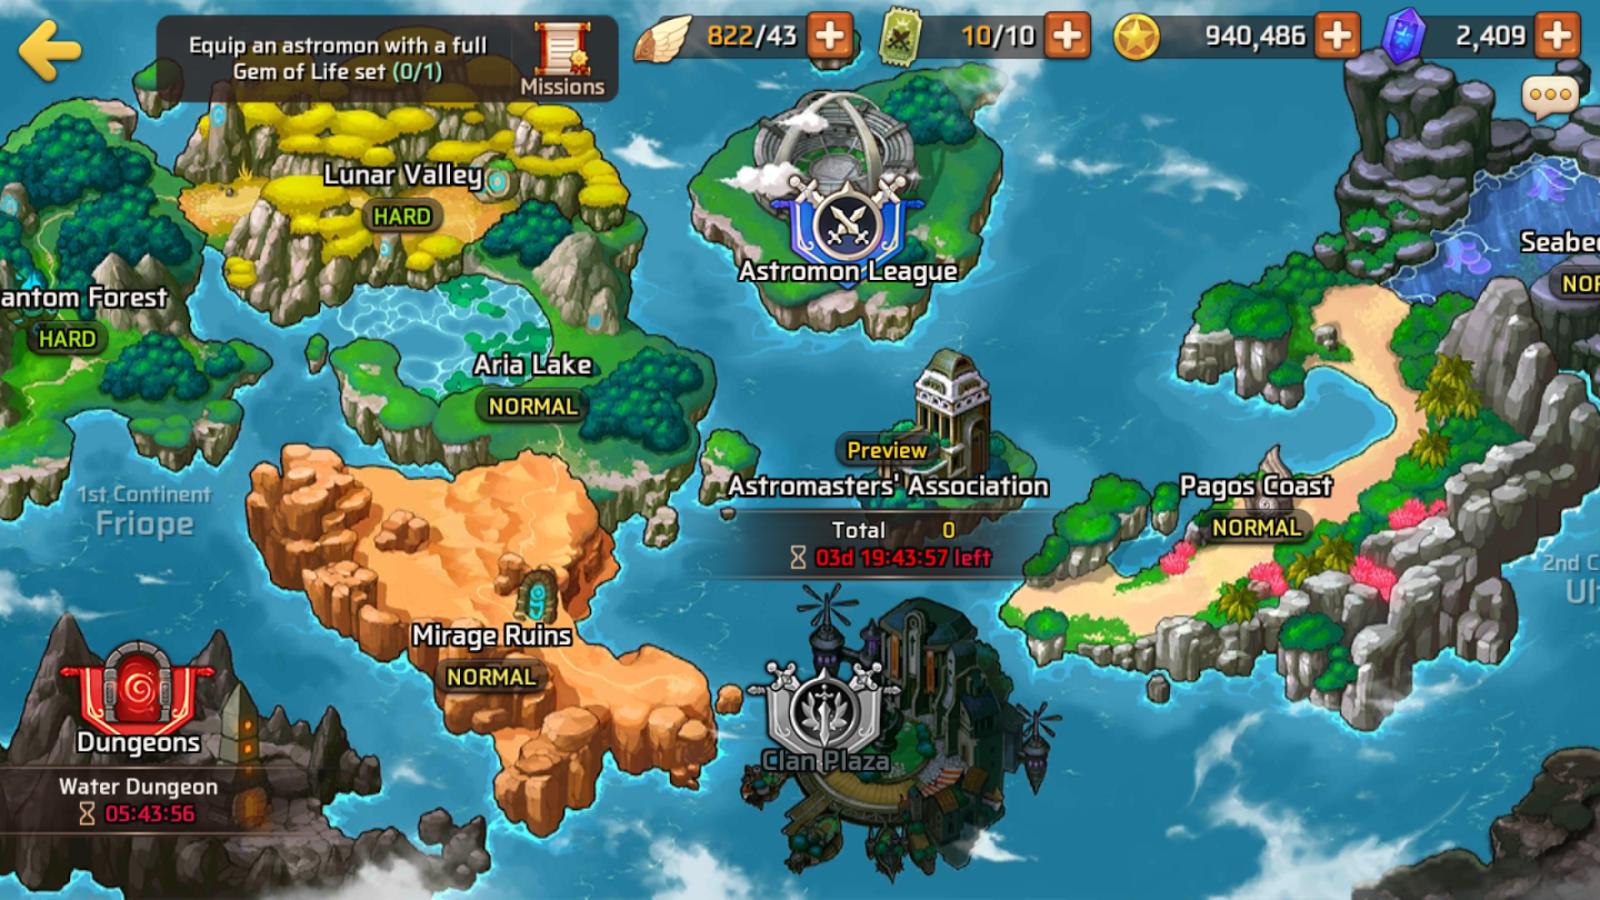 [Online][Mobile] Monster Super League Screenshot_20161221-181605